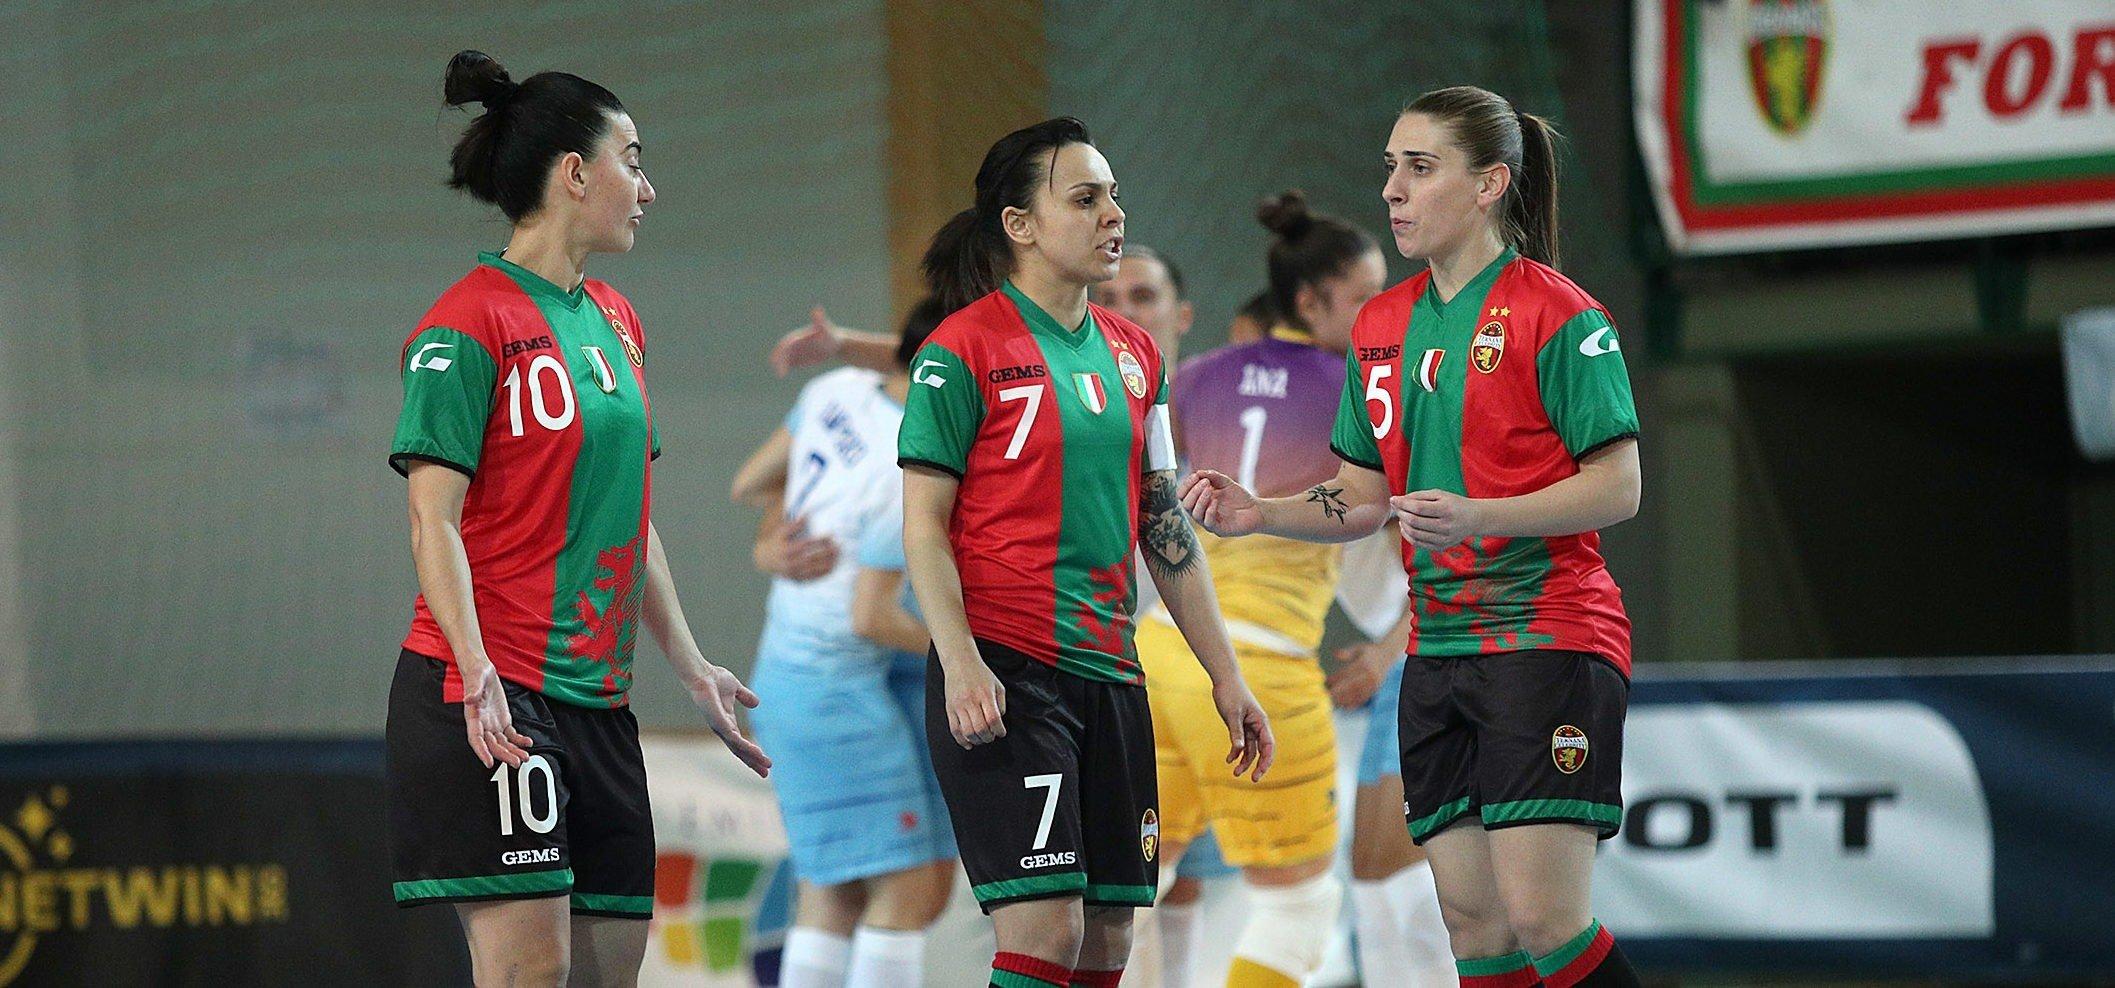 montesilvano ternana calcio femminile